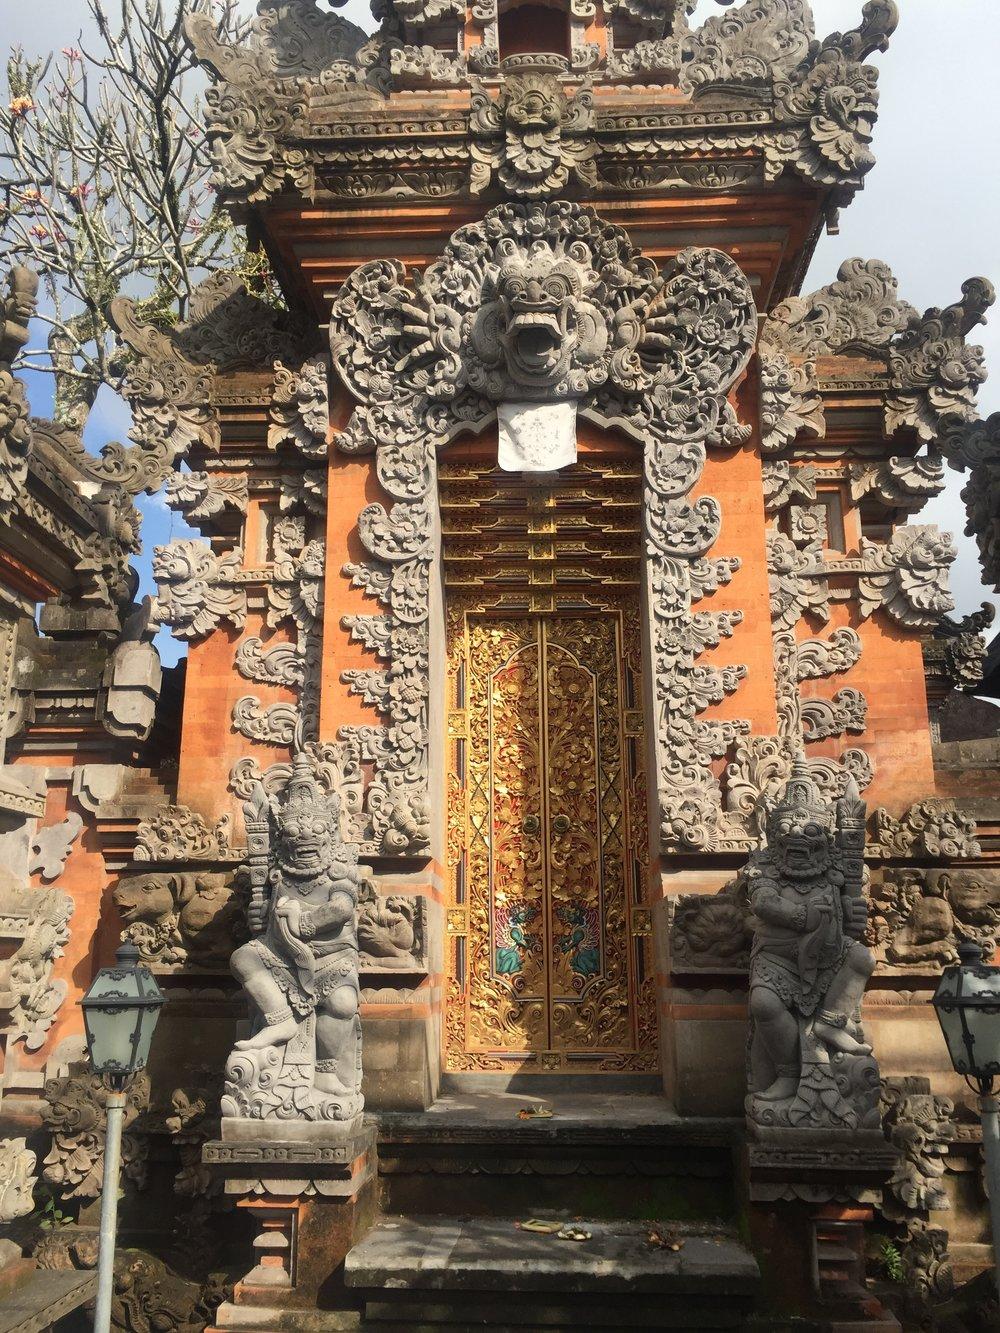 The front door of a Balinese home.